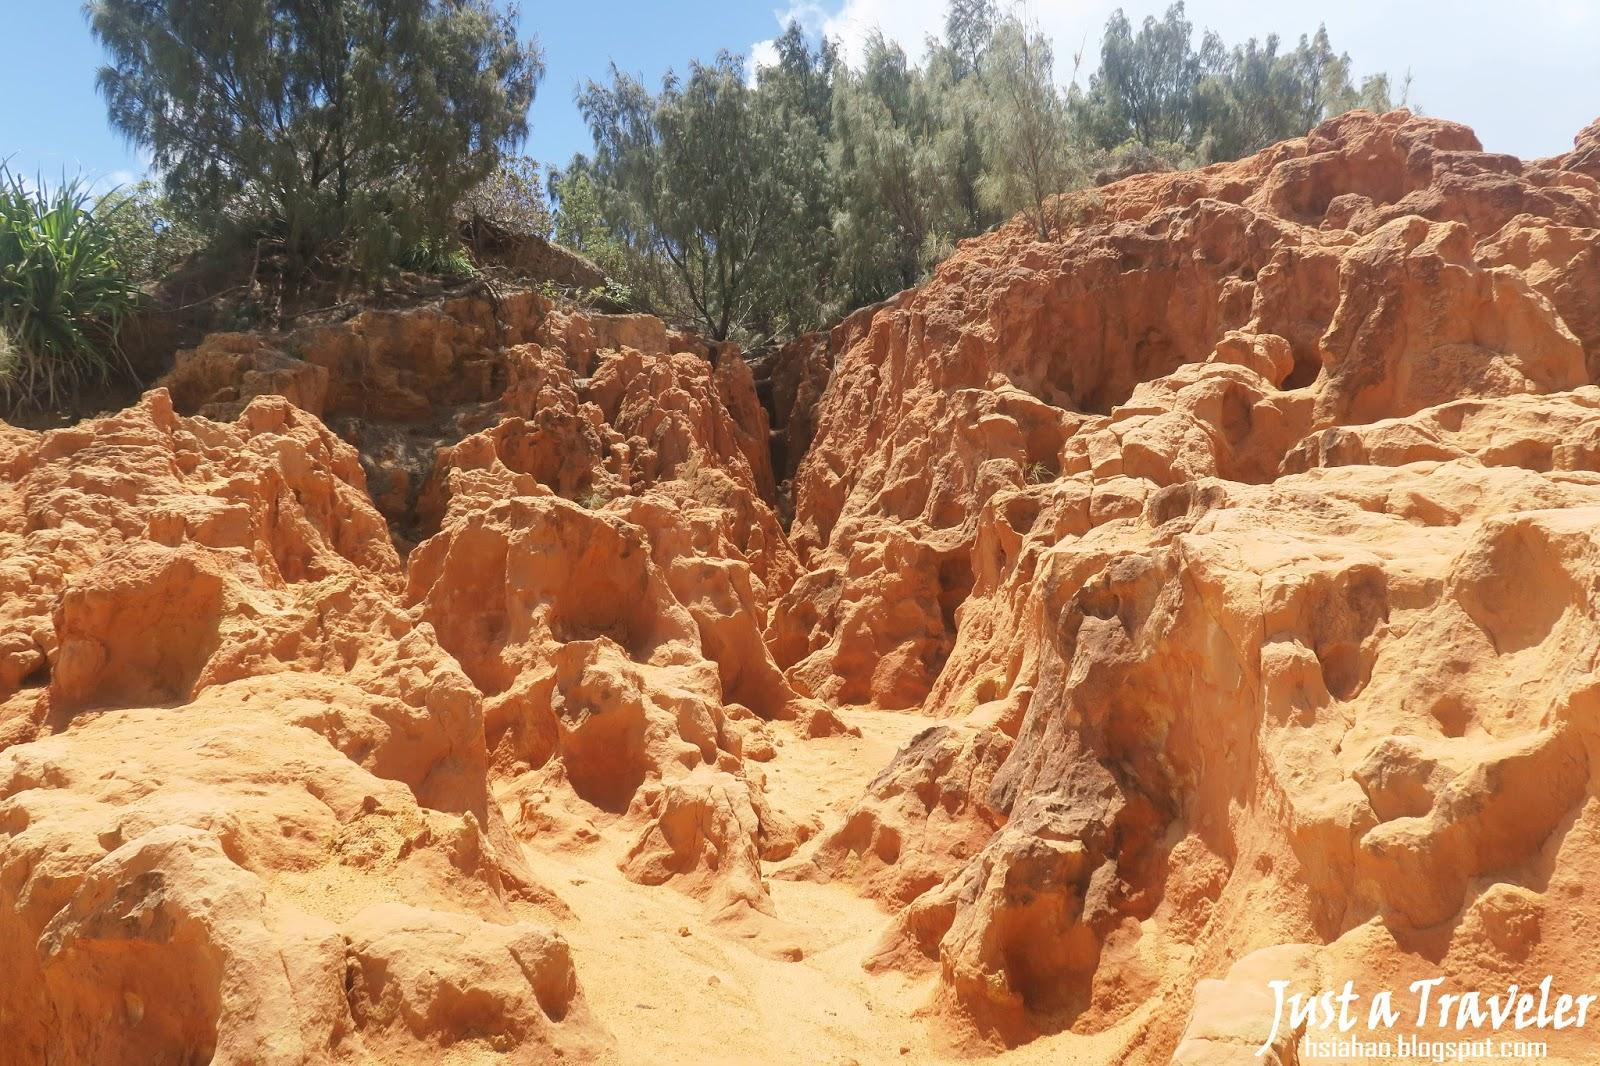 布里斯本-摩頓島-Cape-Cliff-景點-交通-住宿-推薦-旅遊-自由行-澳洲-Brisbane-Moreton-Island-Tourist-Attraction-Travel-Australia